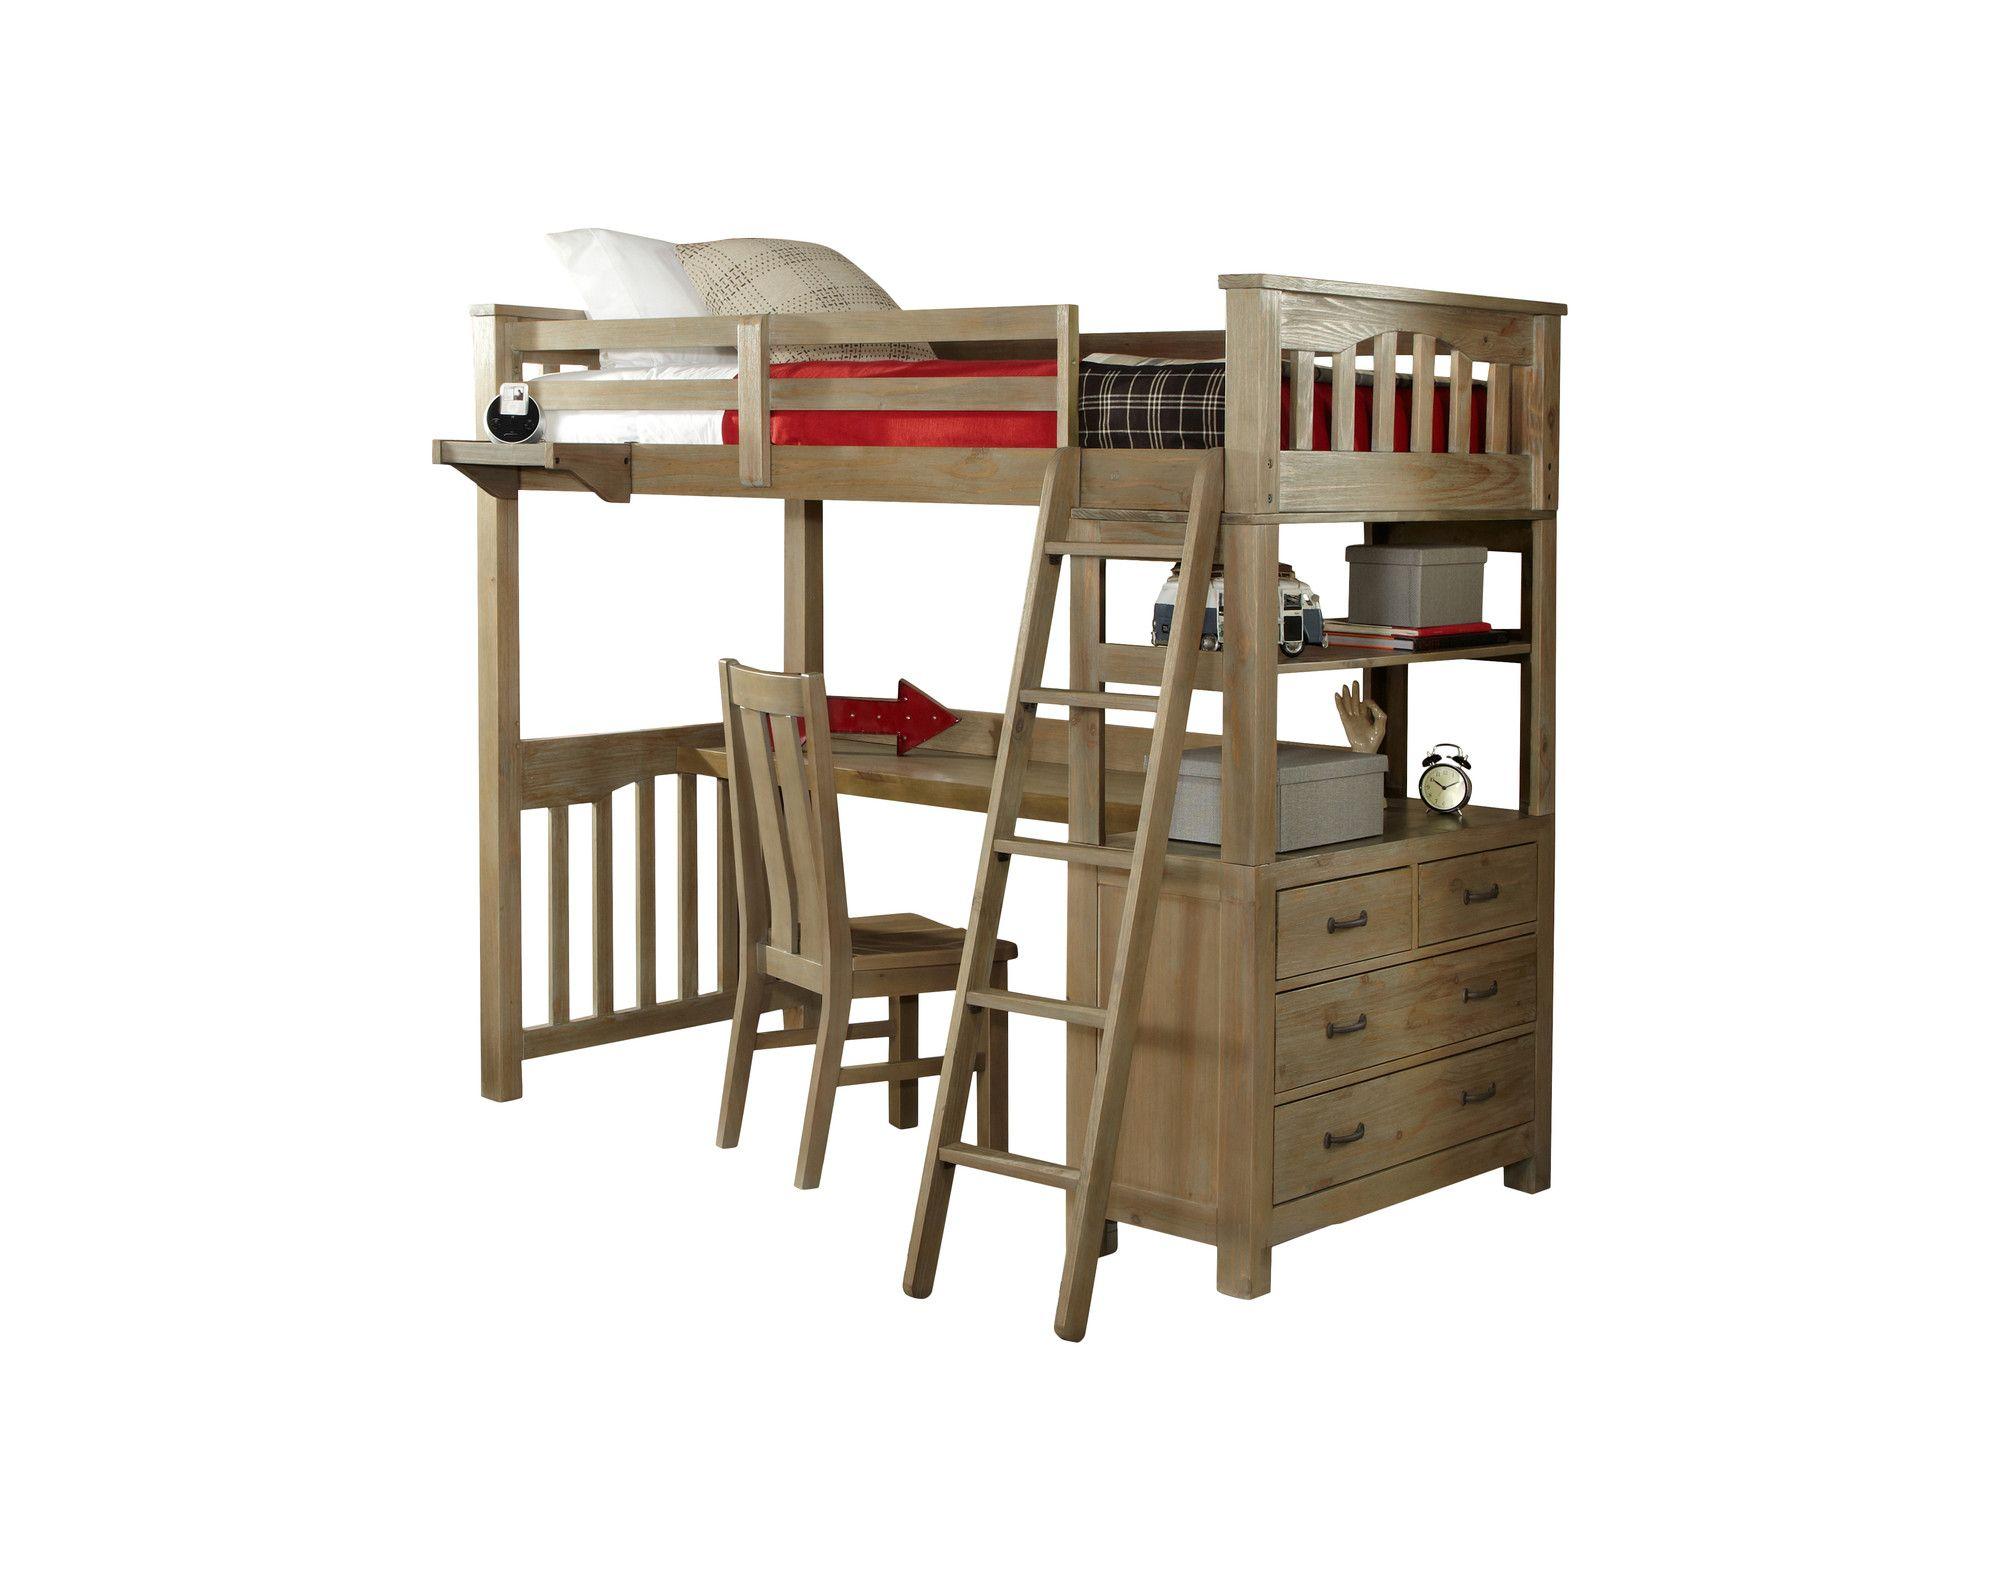 Viv Rae Wilbur Loft Bed With Desk Reviews Birch Lane Ry